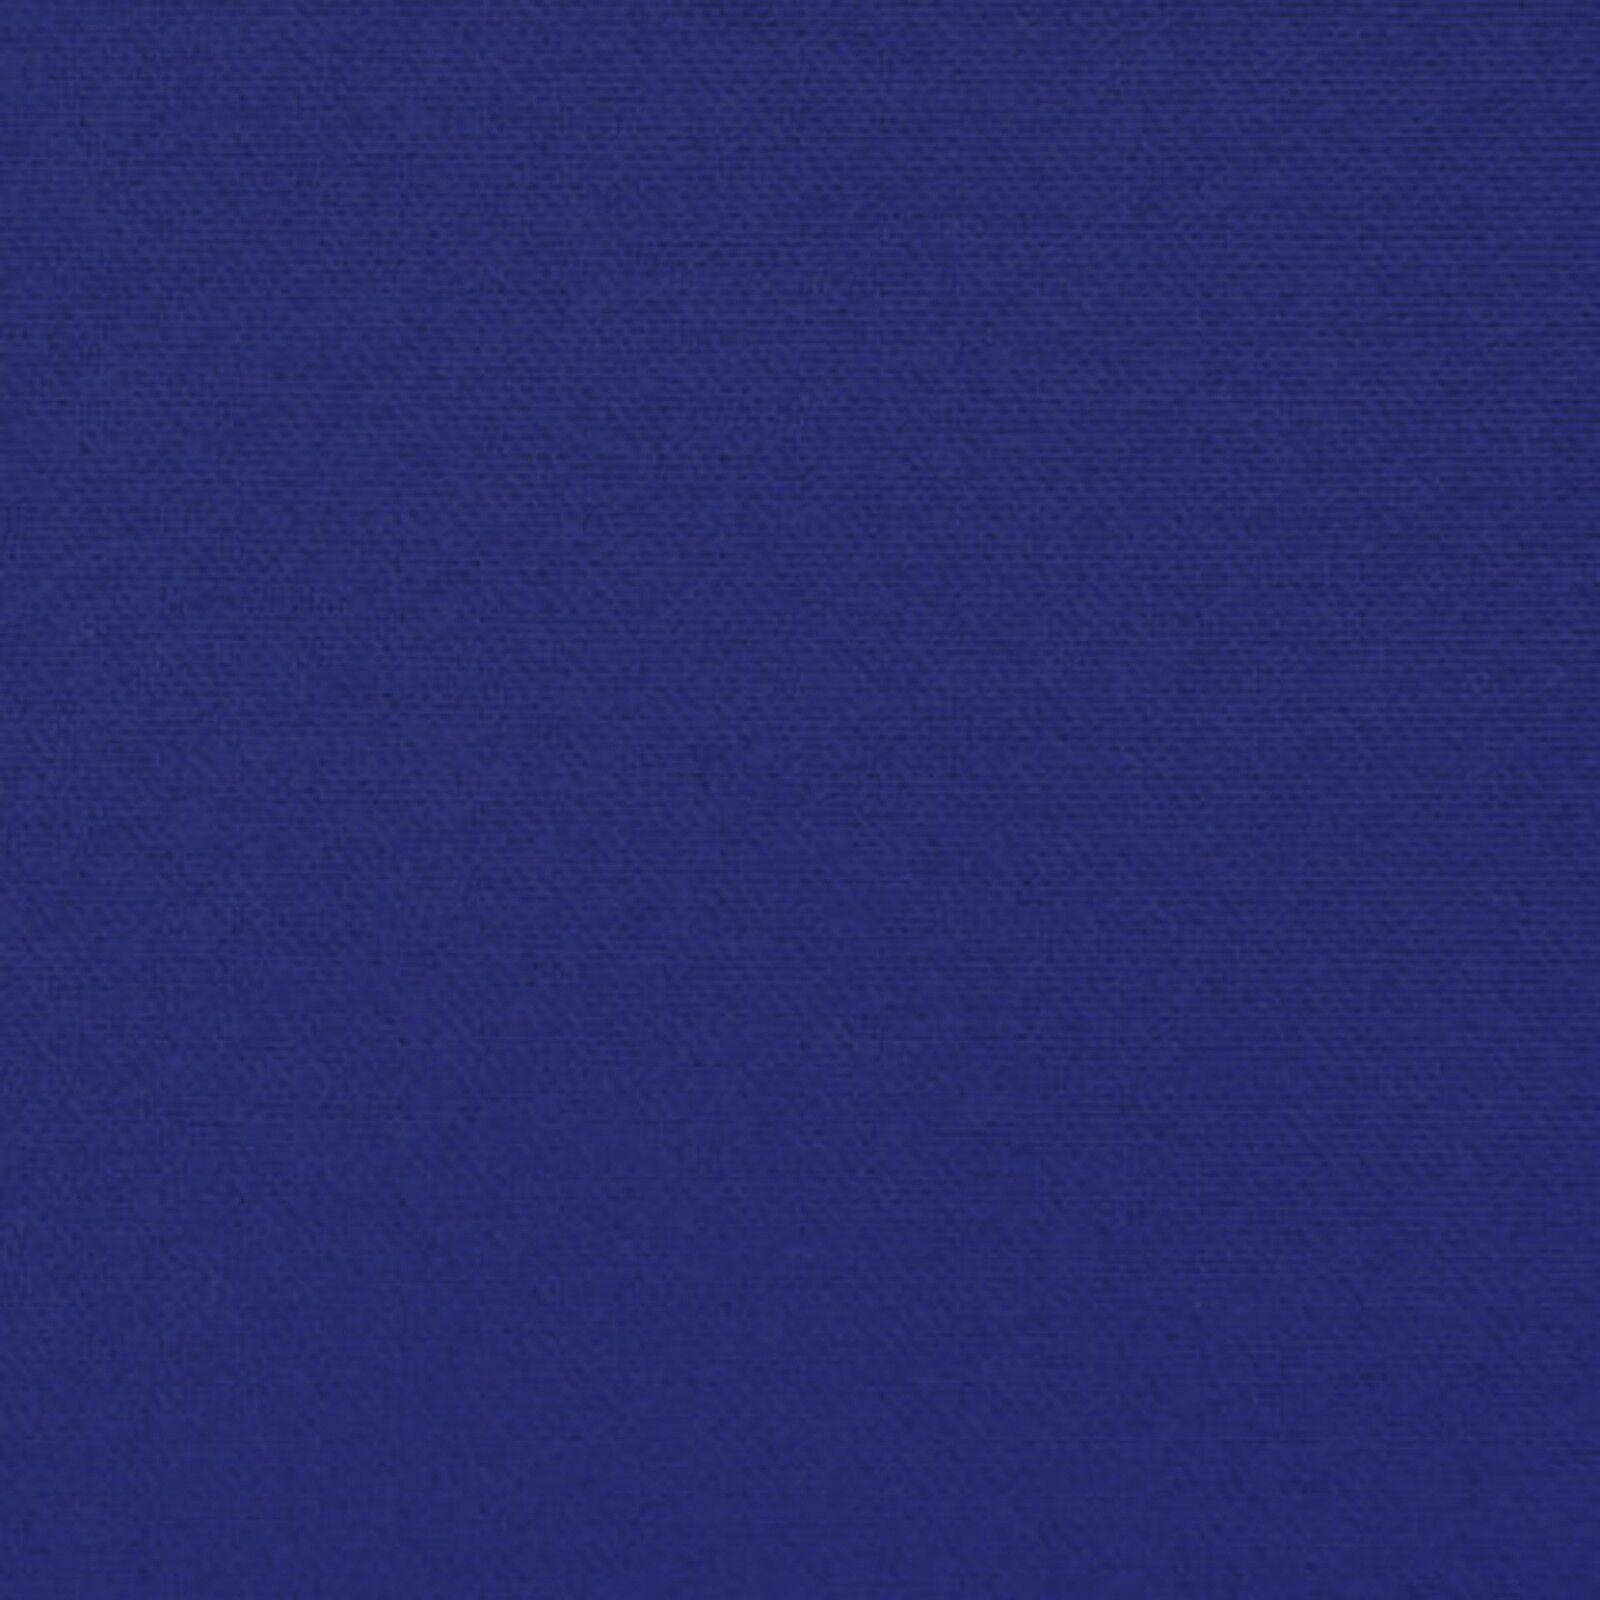 Blue Sunbrella Upholstery Fabric by Ralph Lauren R$208y Sun